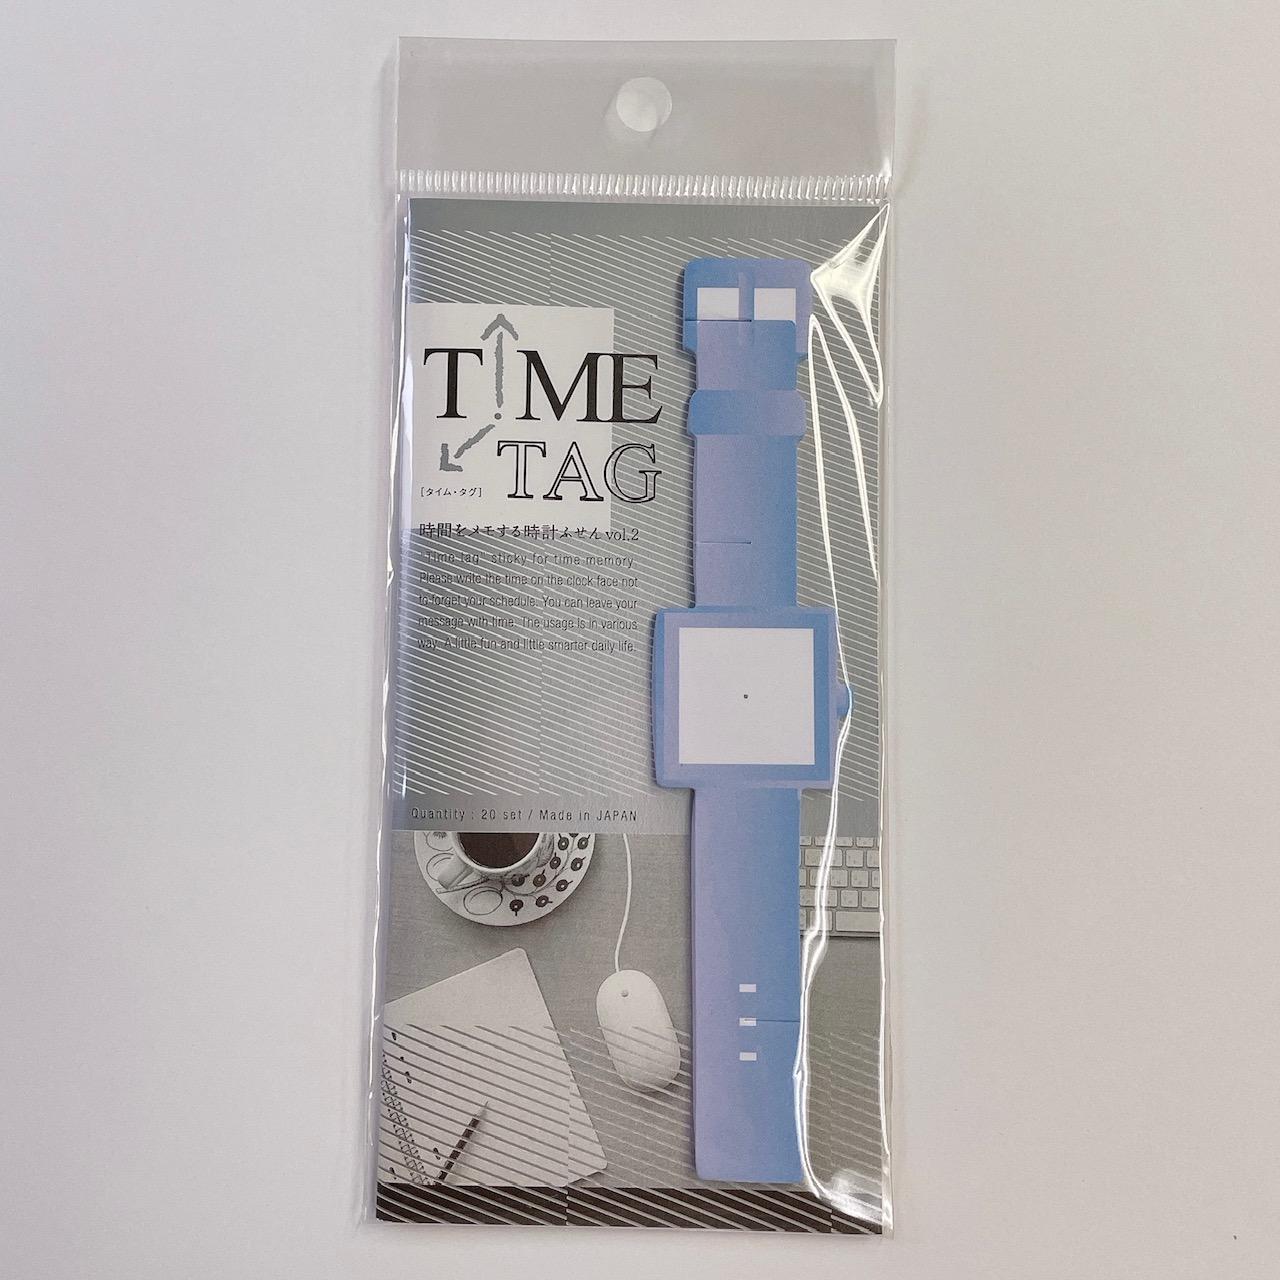 JMT002 TimeTag時間をメモする時計付箋Vol2